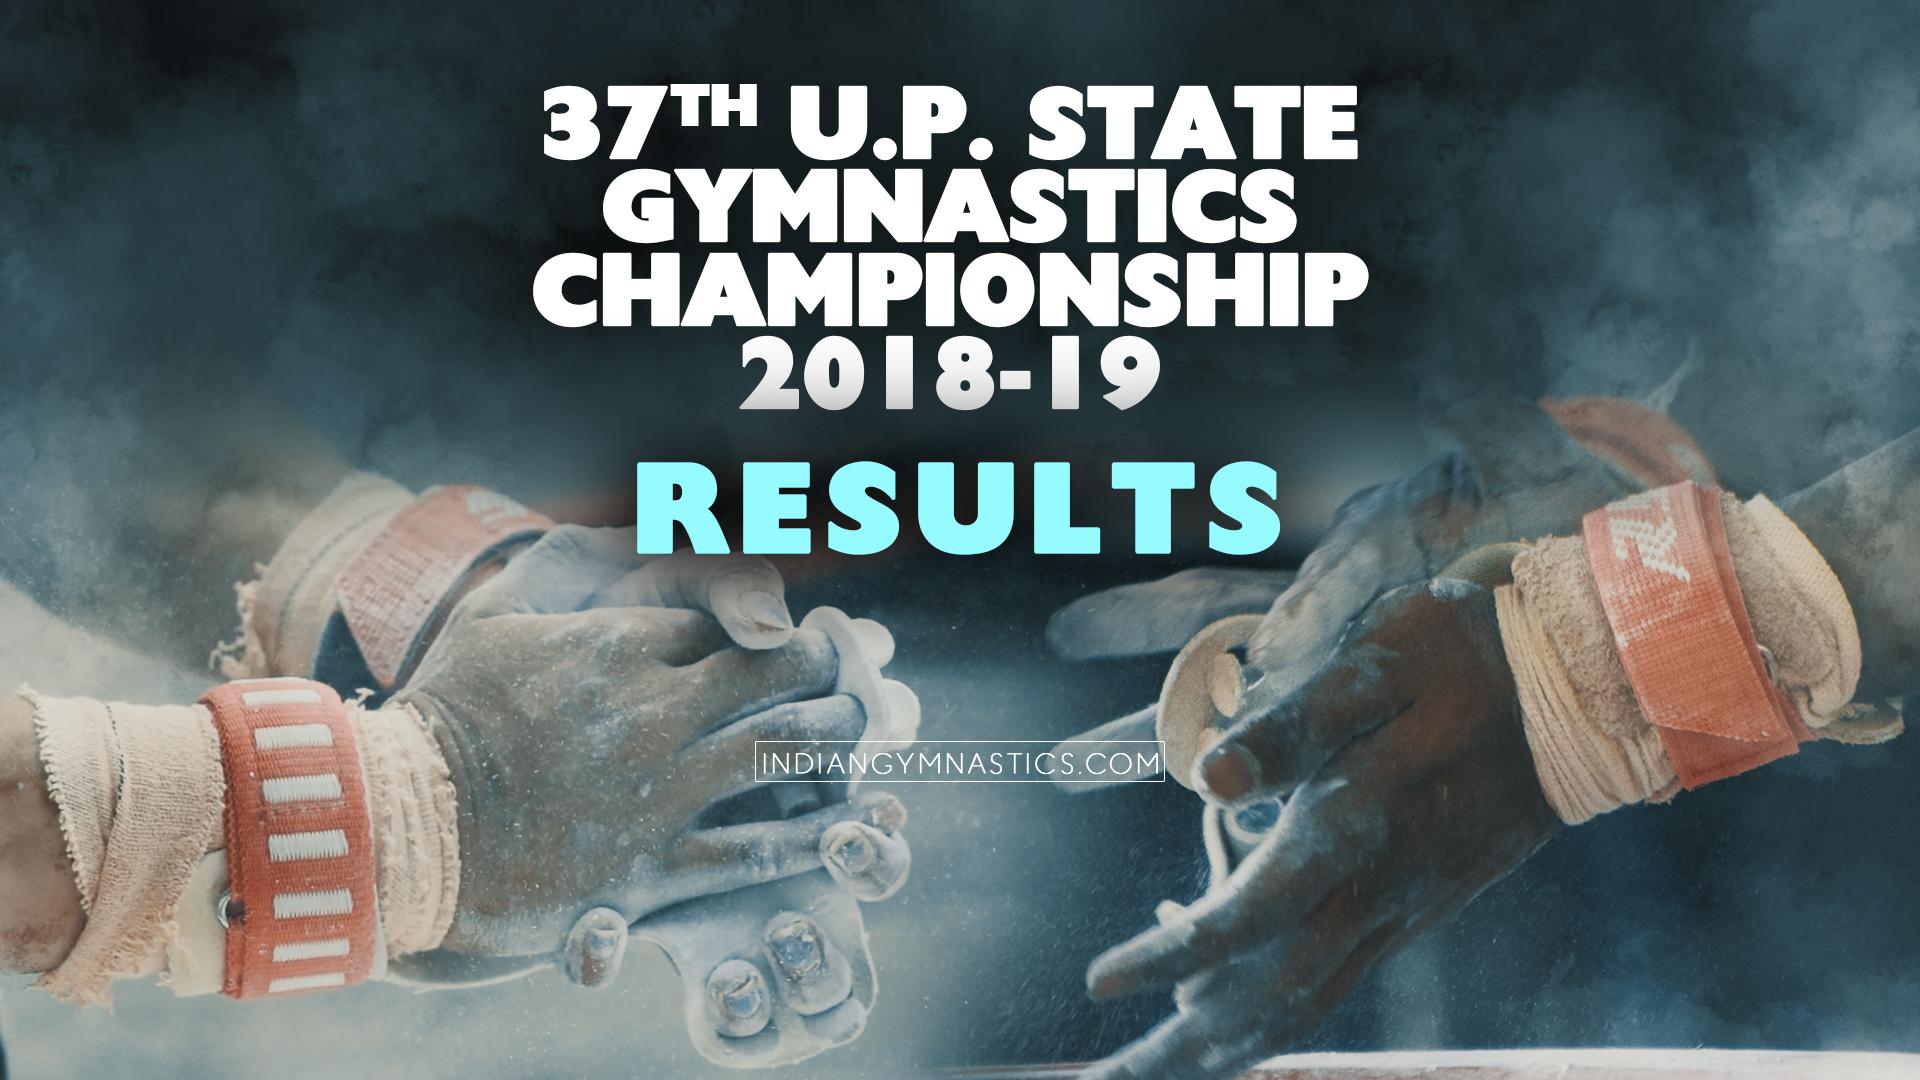 37th U.P. State Gymnastics Championship 2018-19   Results